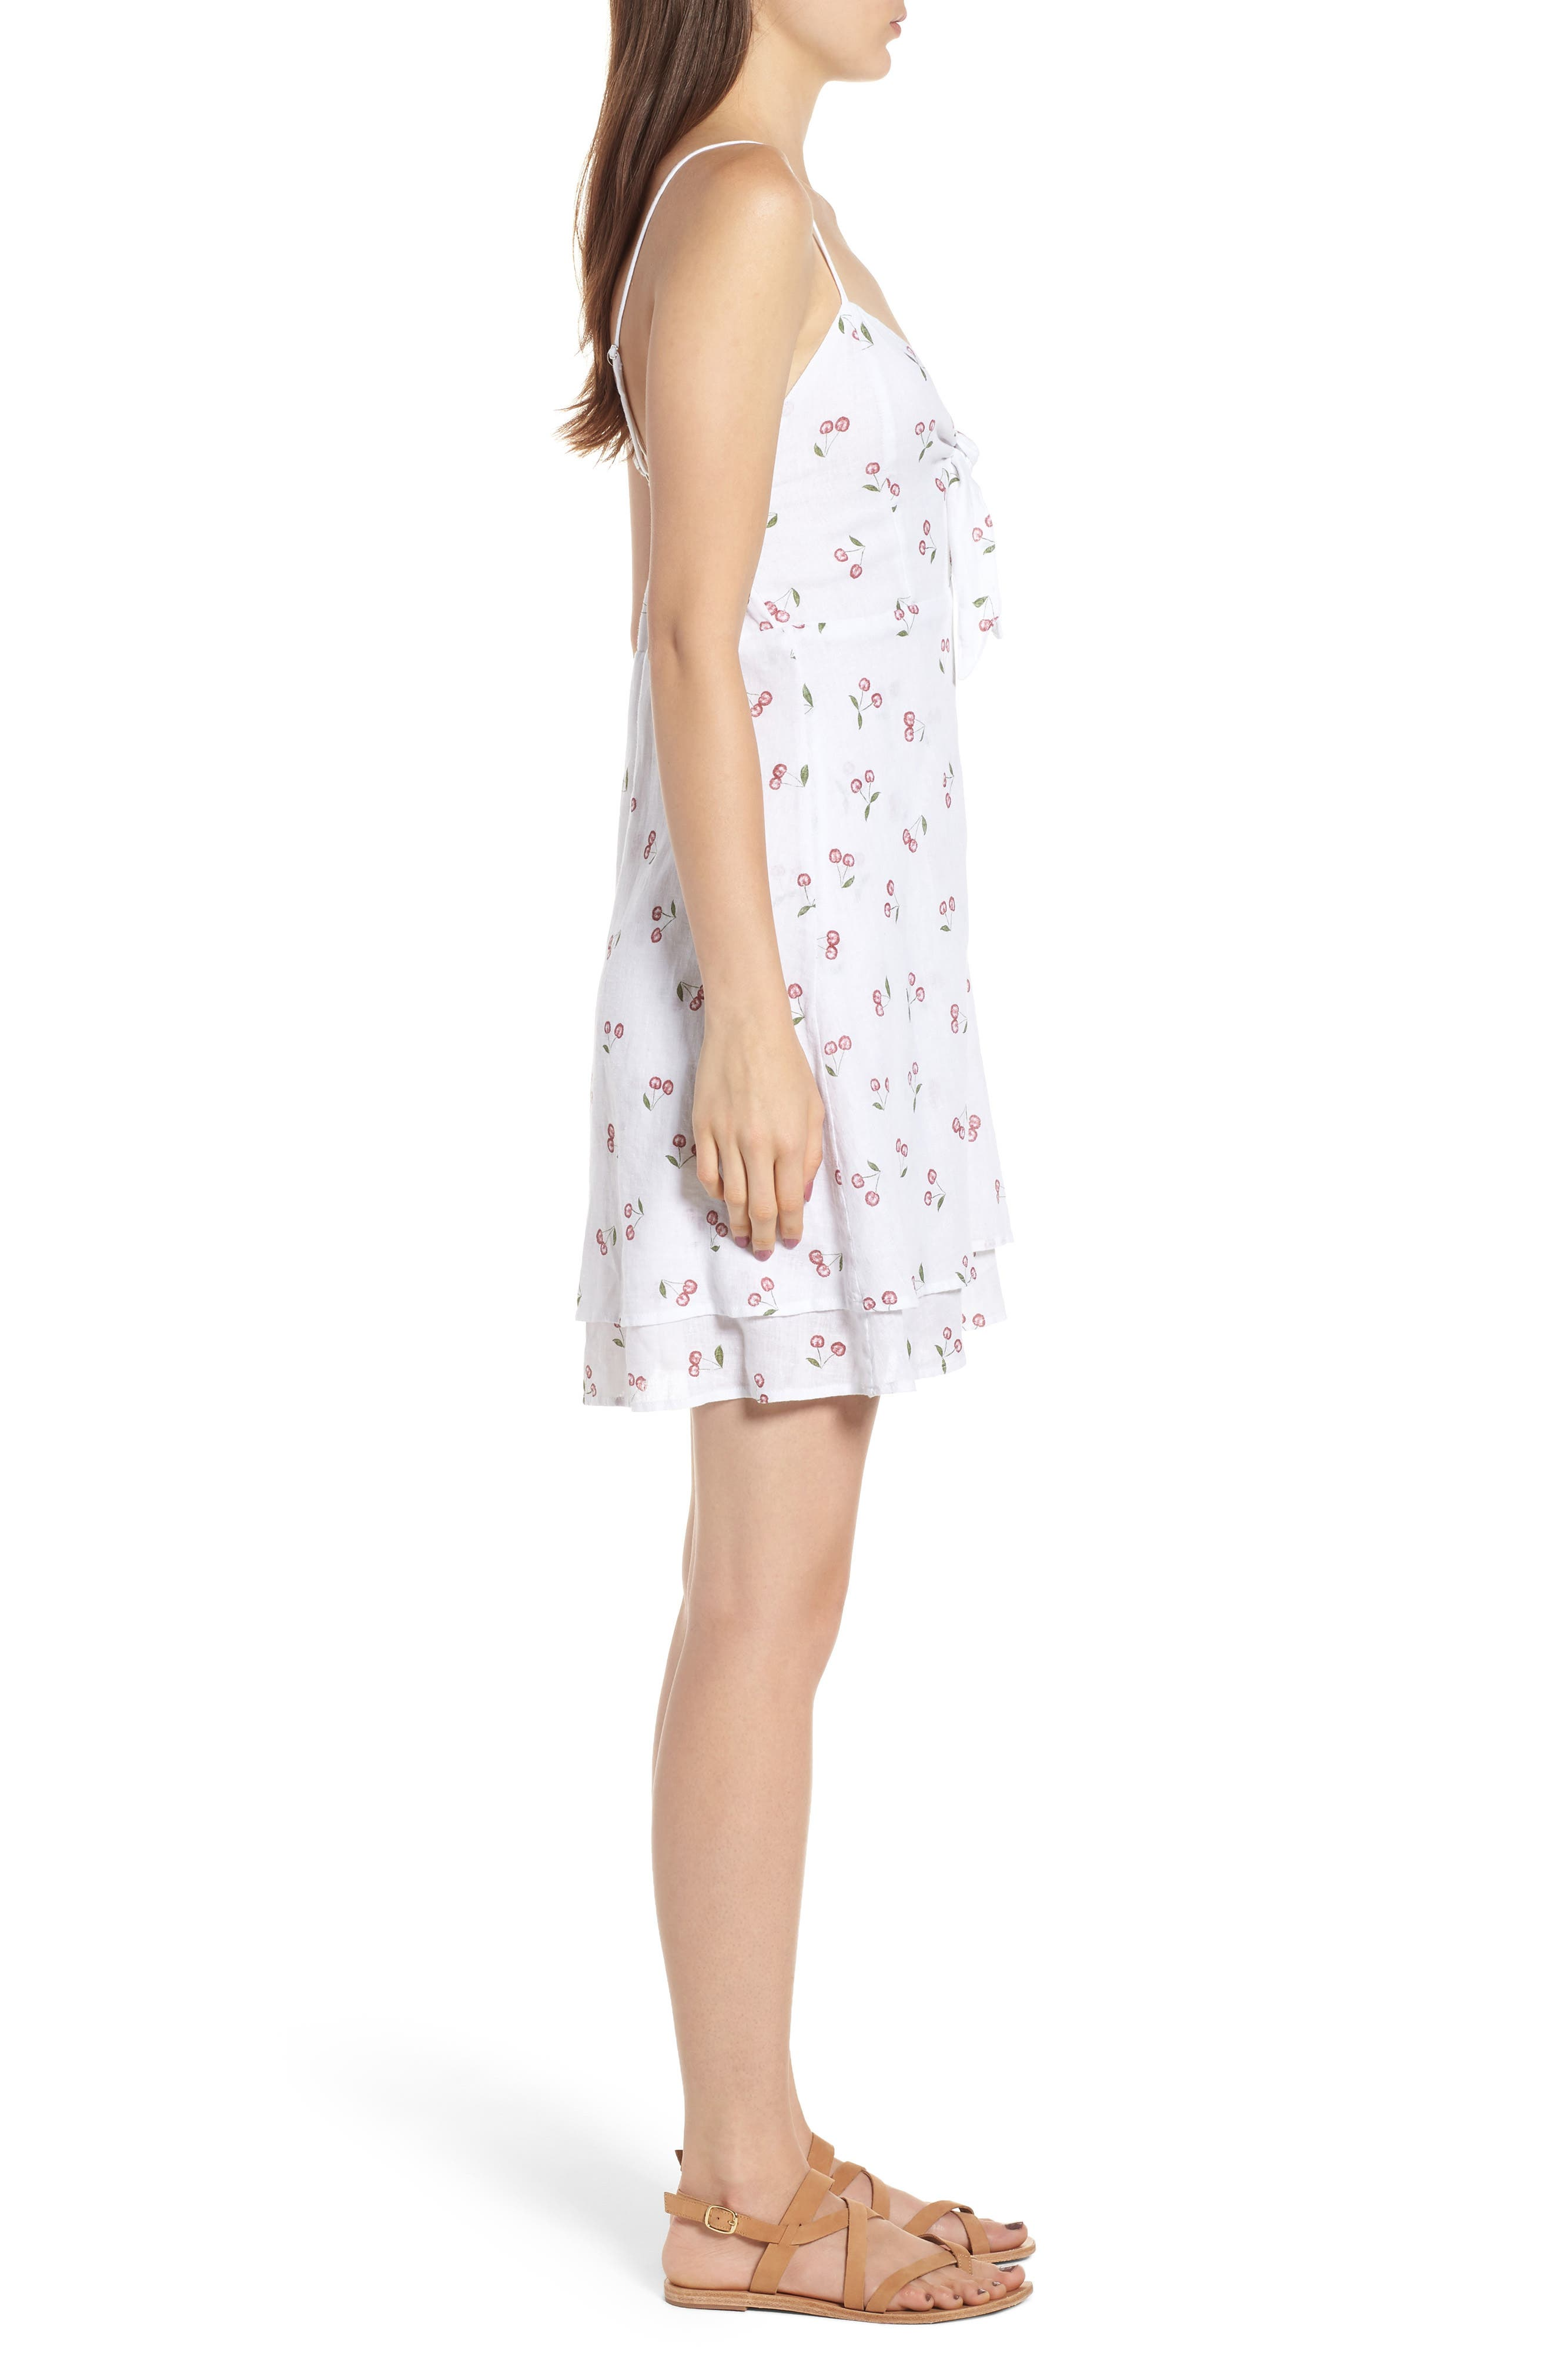 August Daisy Tie Front Dress,                             Alternate thumbnail 3, color,                             WHITE CHERRIES